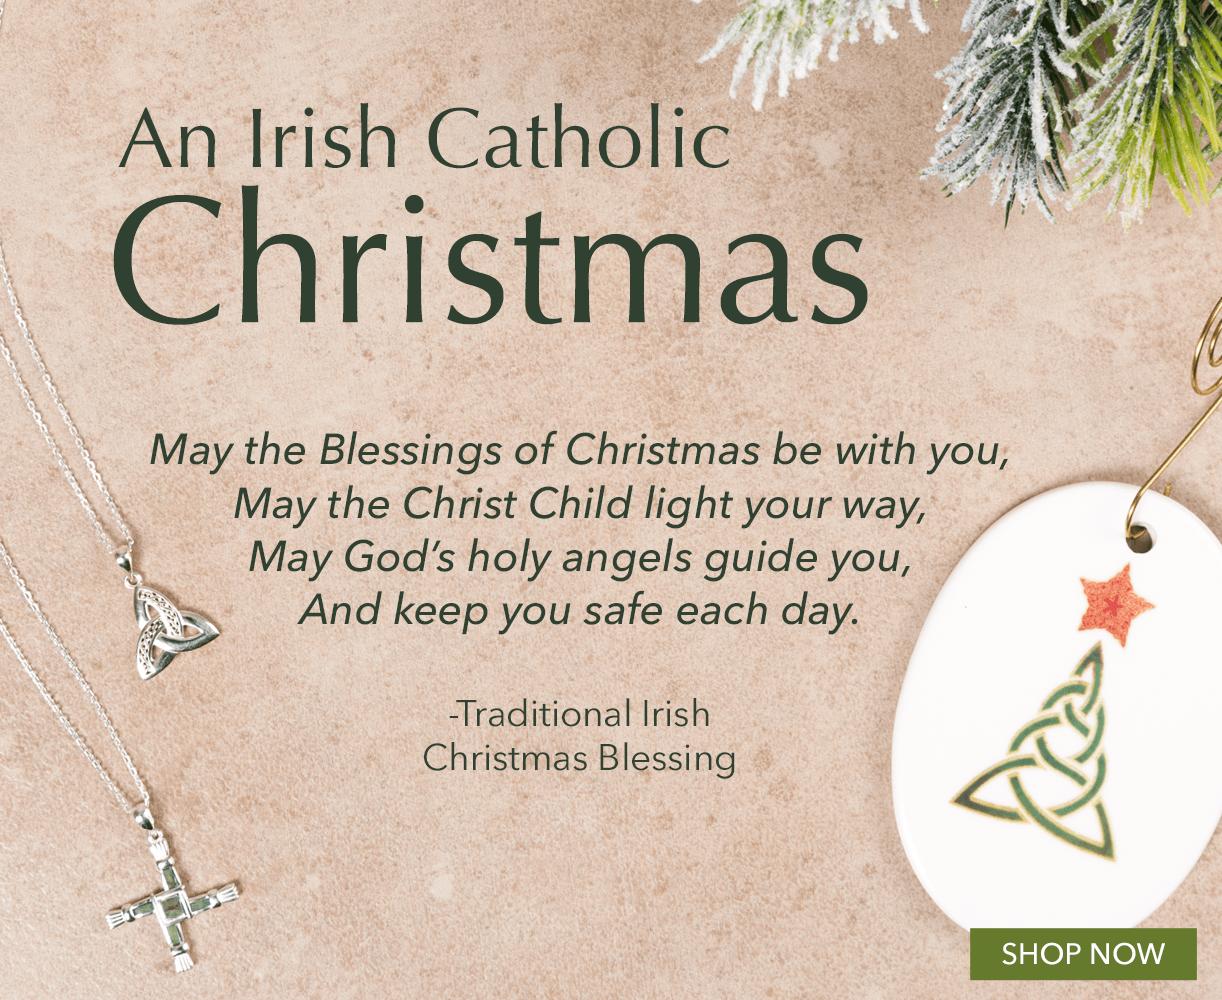 Irish Christmas Blessing.Trinity Road Websites Have A Merry Irish Catholic Christmas